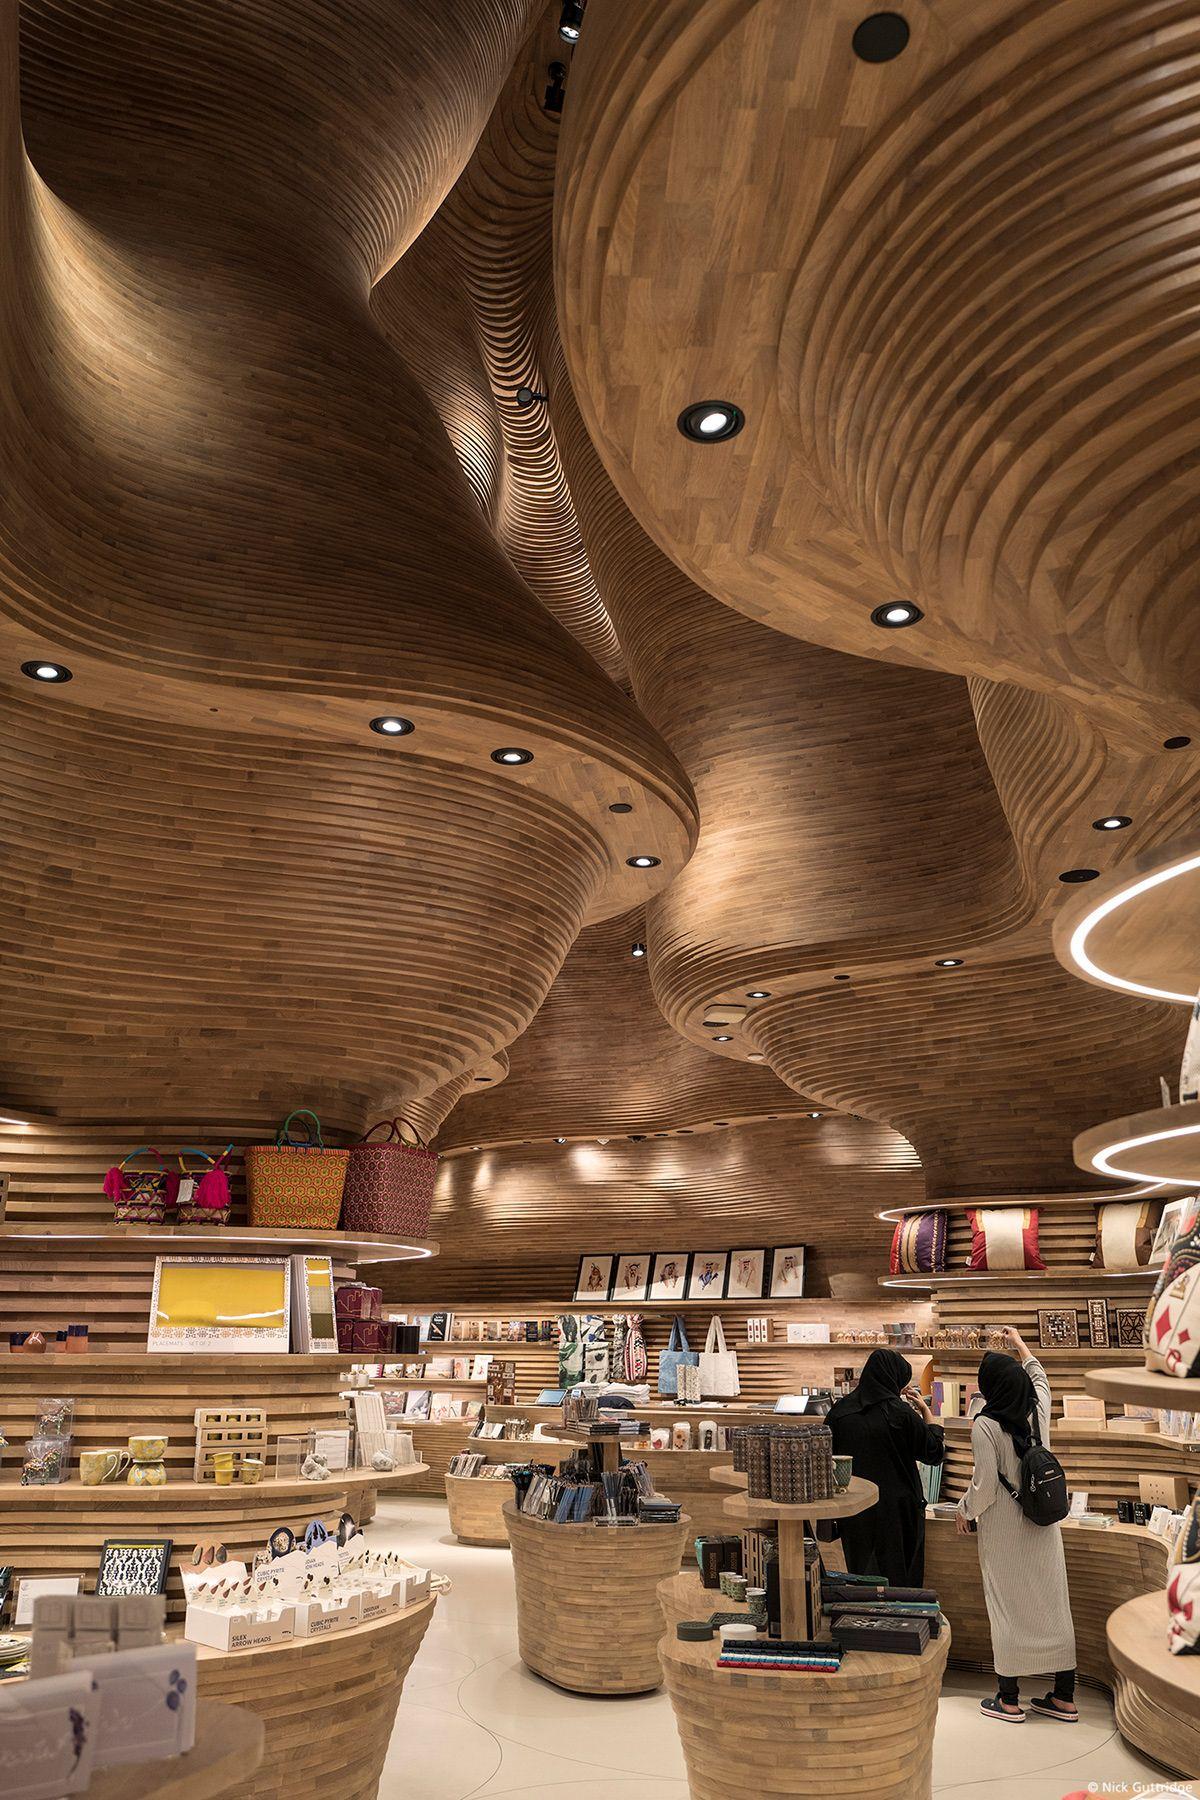 Qatar National Museum - Jean Nouvel on Behance